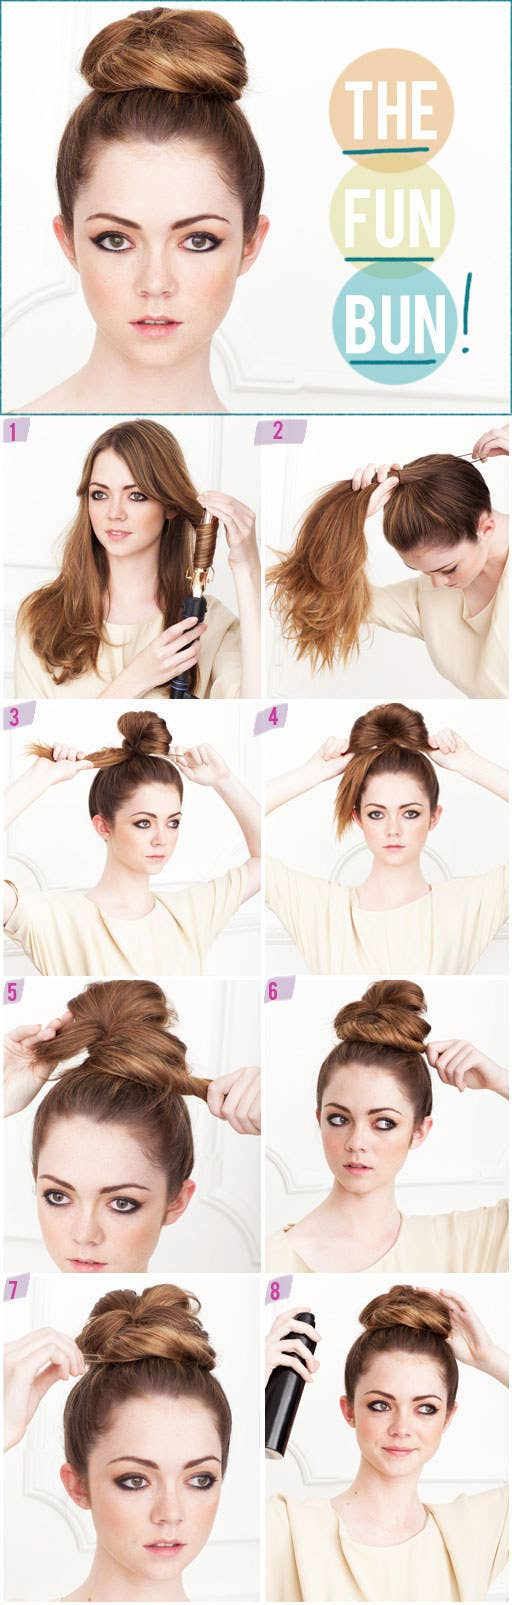 Wrap Hair Around The Base For A Sturdier Messy Bun